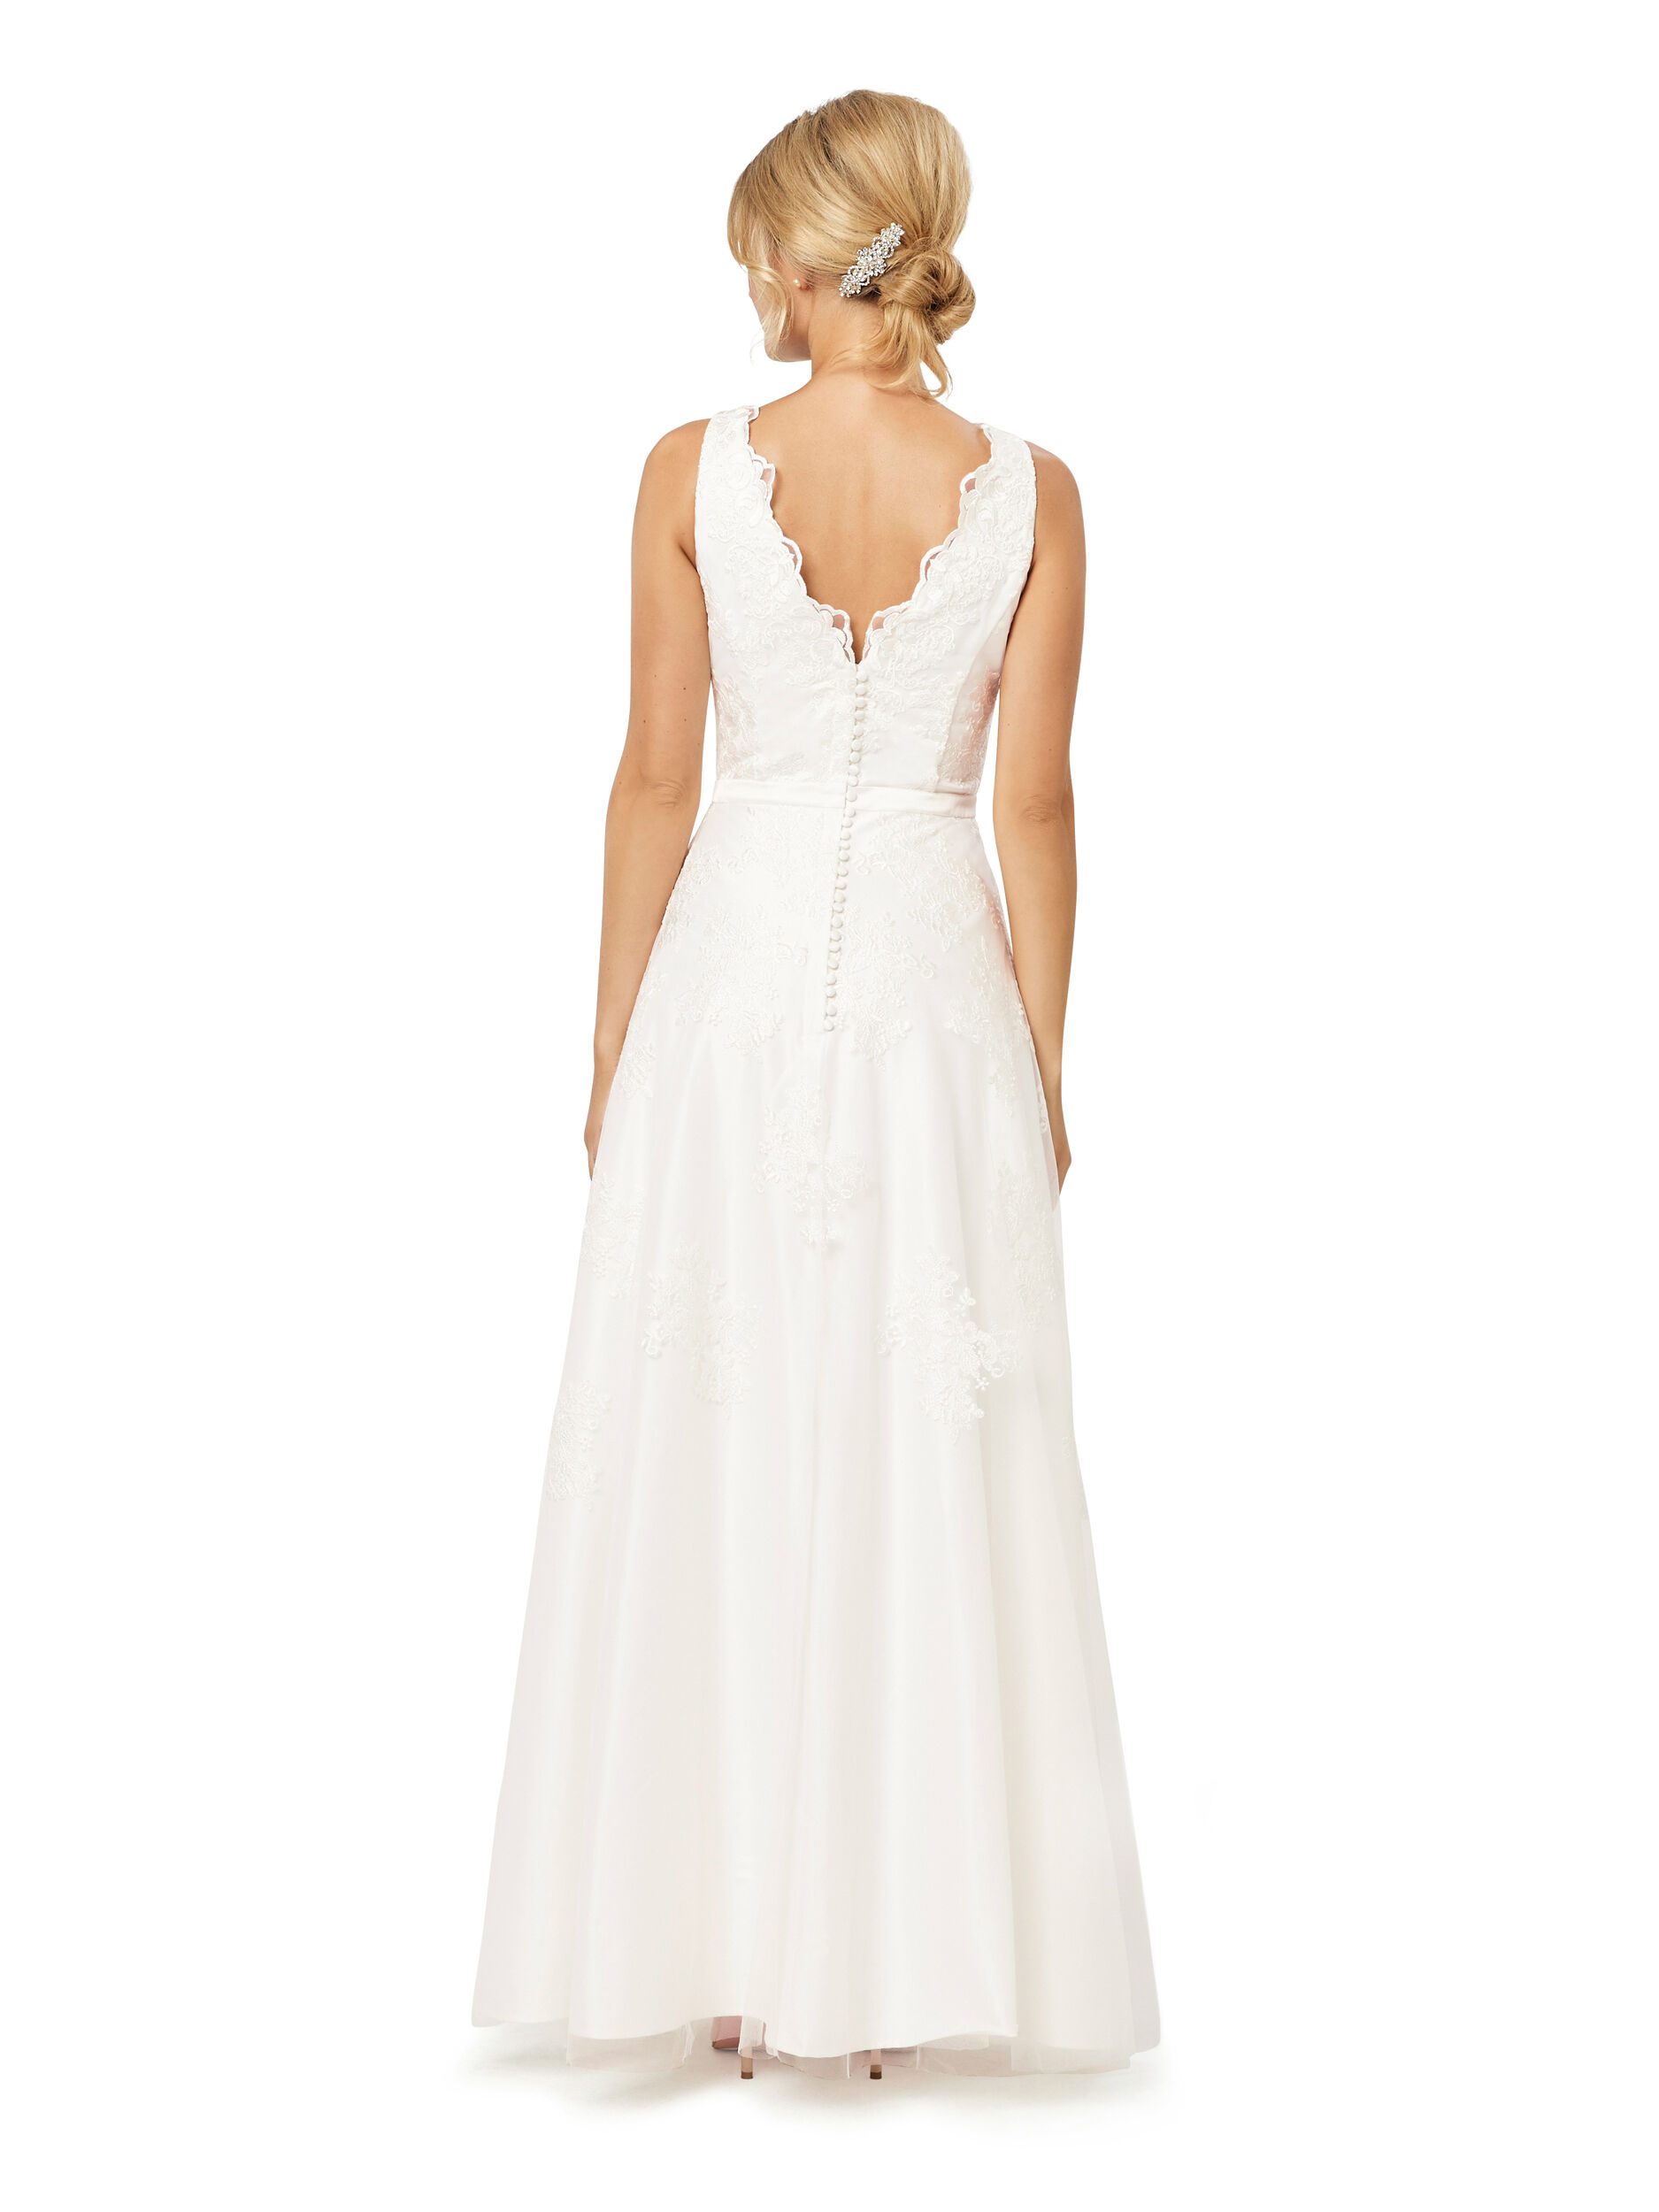 Faithfully Yours Maxi Dress